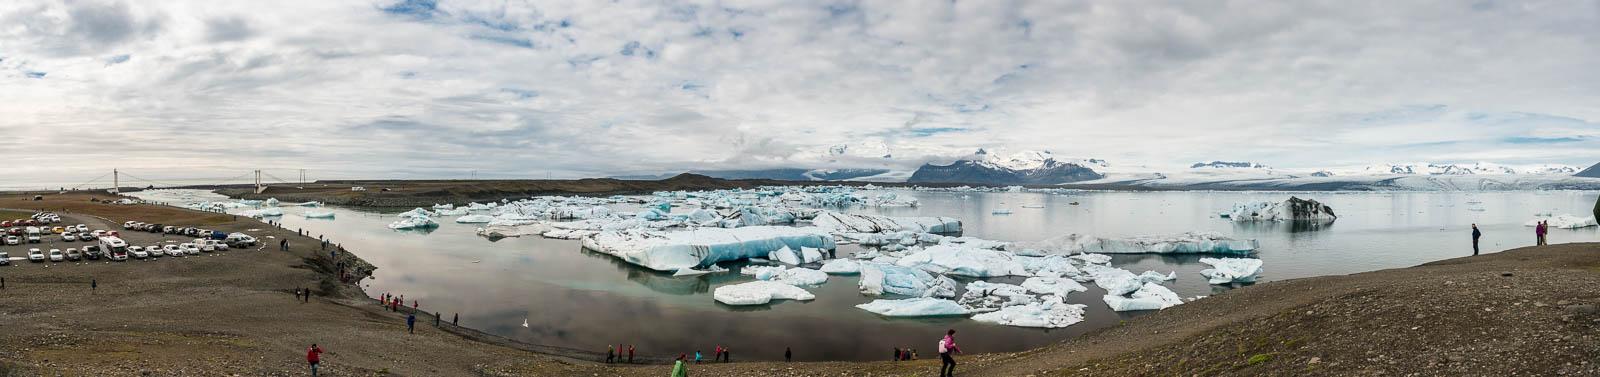 iceland-glacier-17